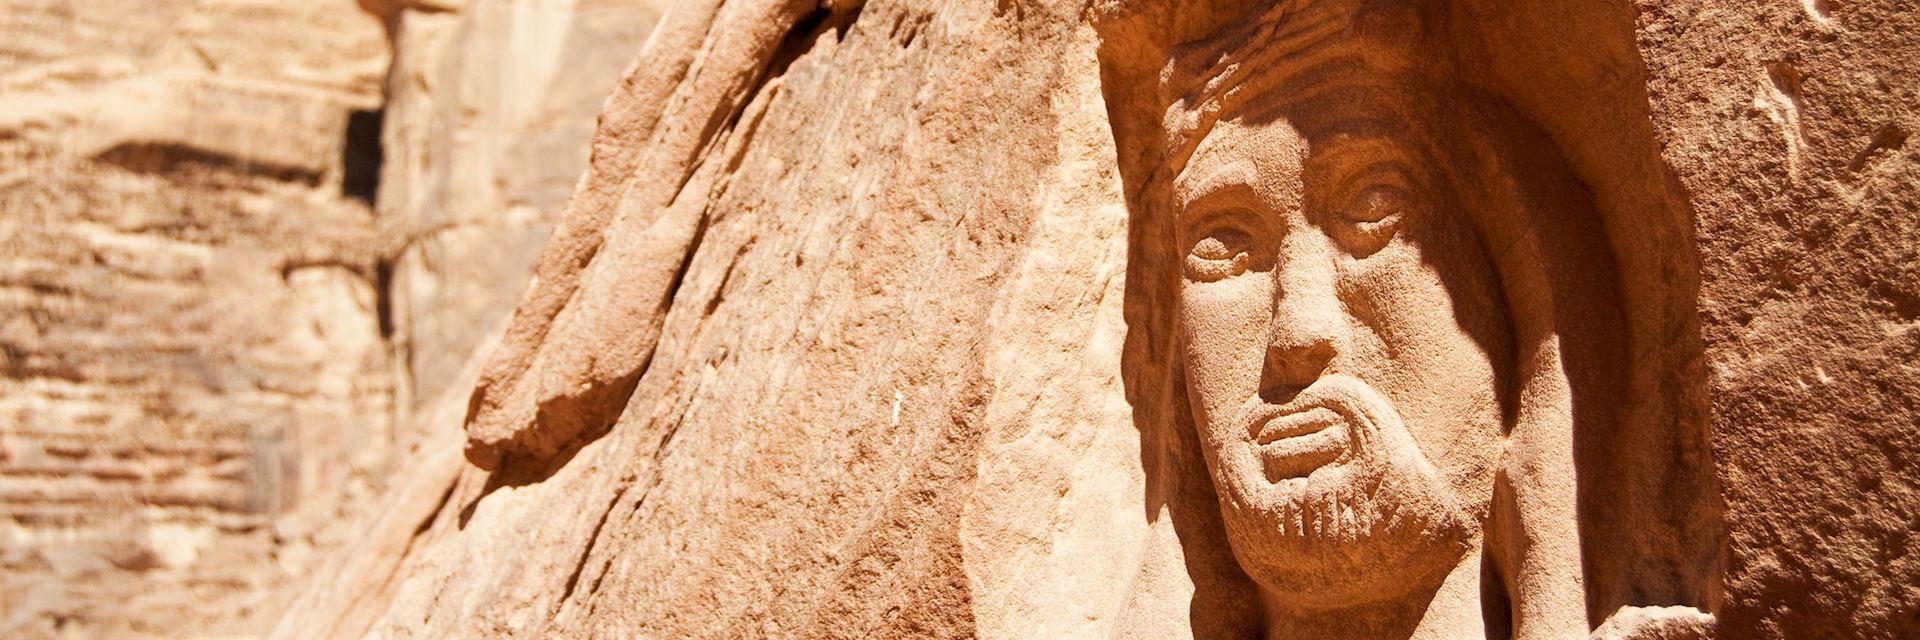 Carving of Lawrence of Arabia, Wadi Rum